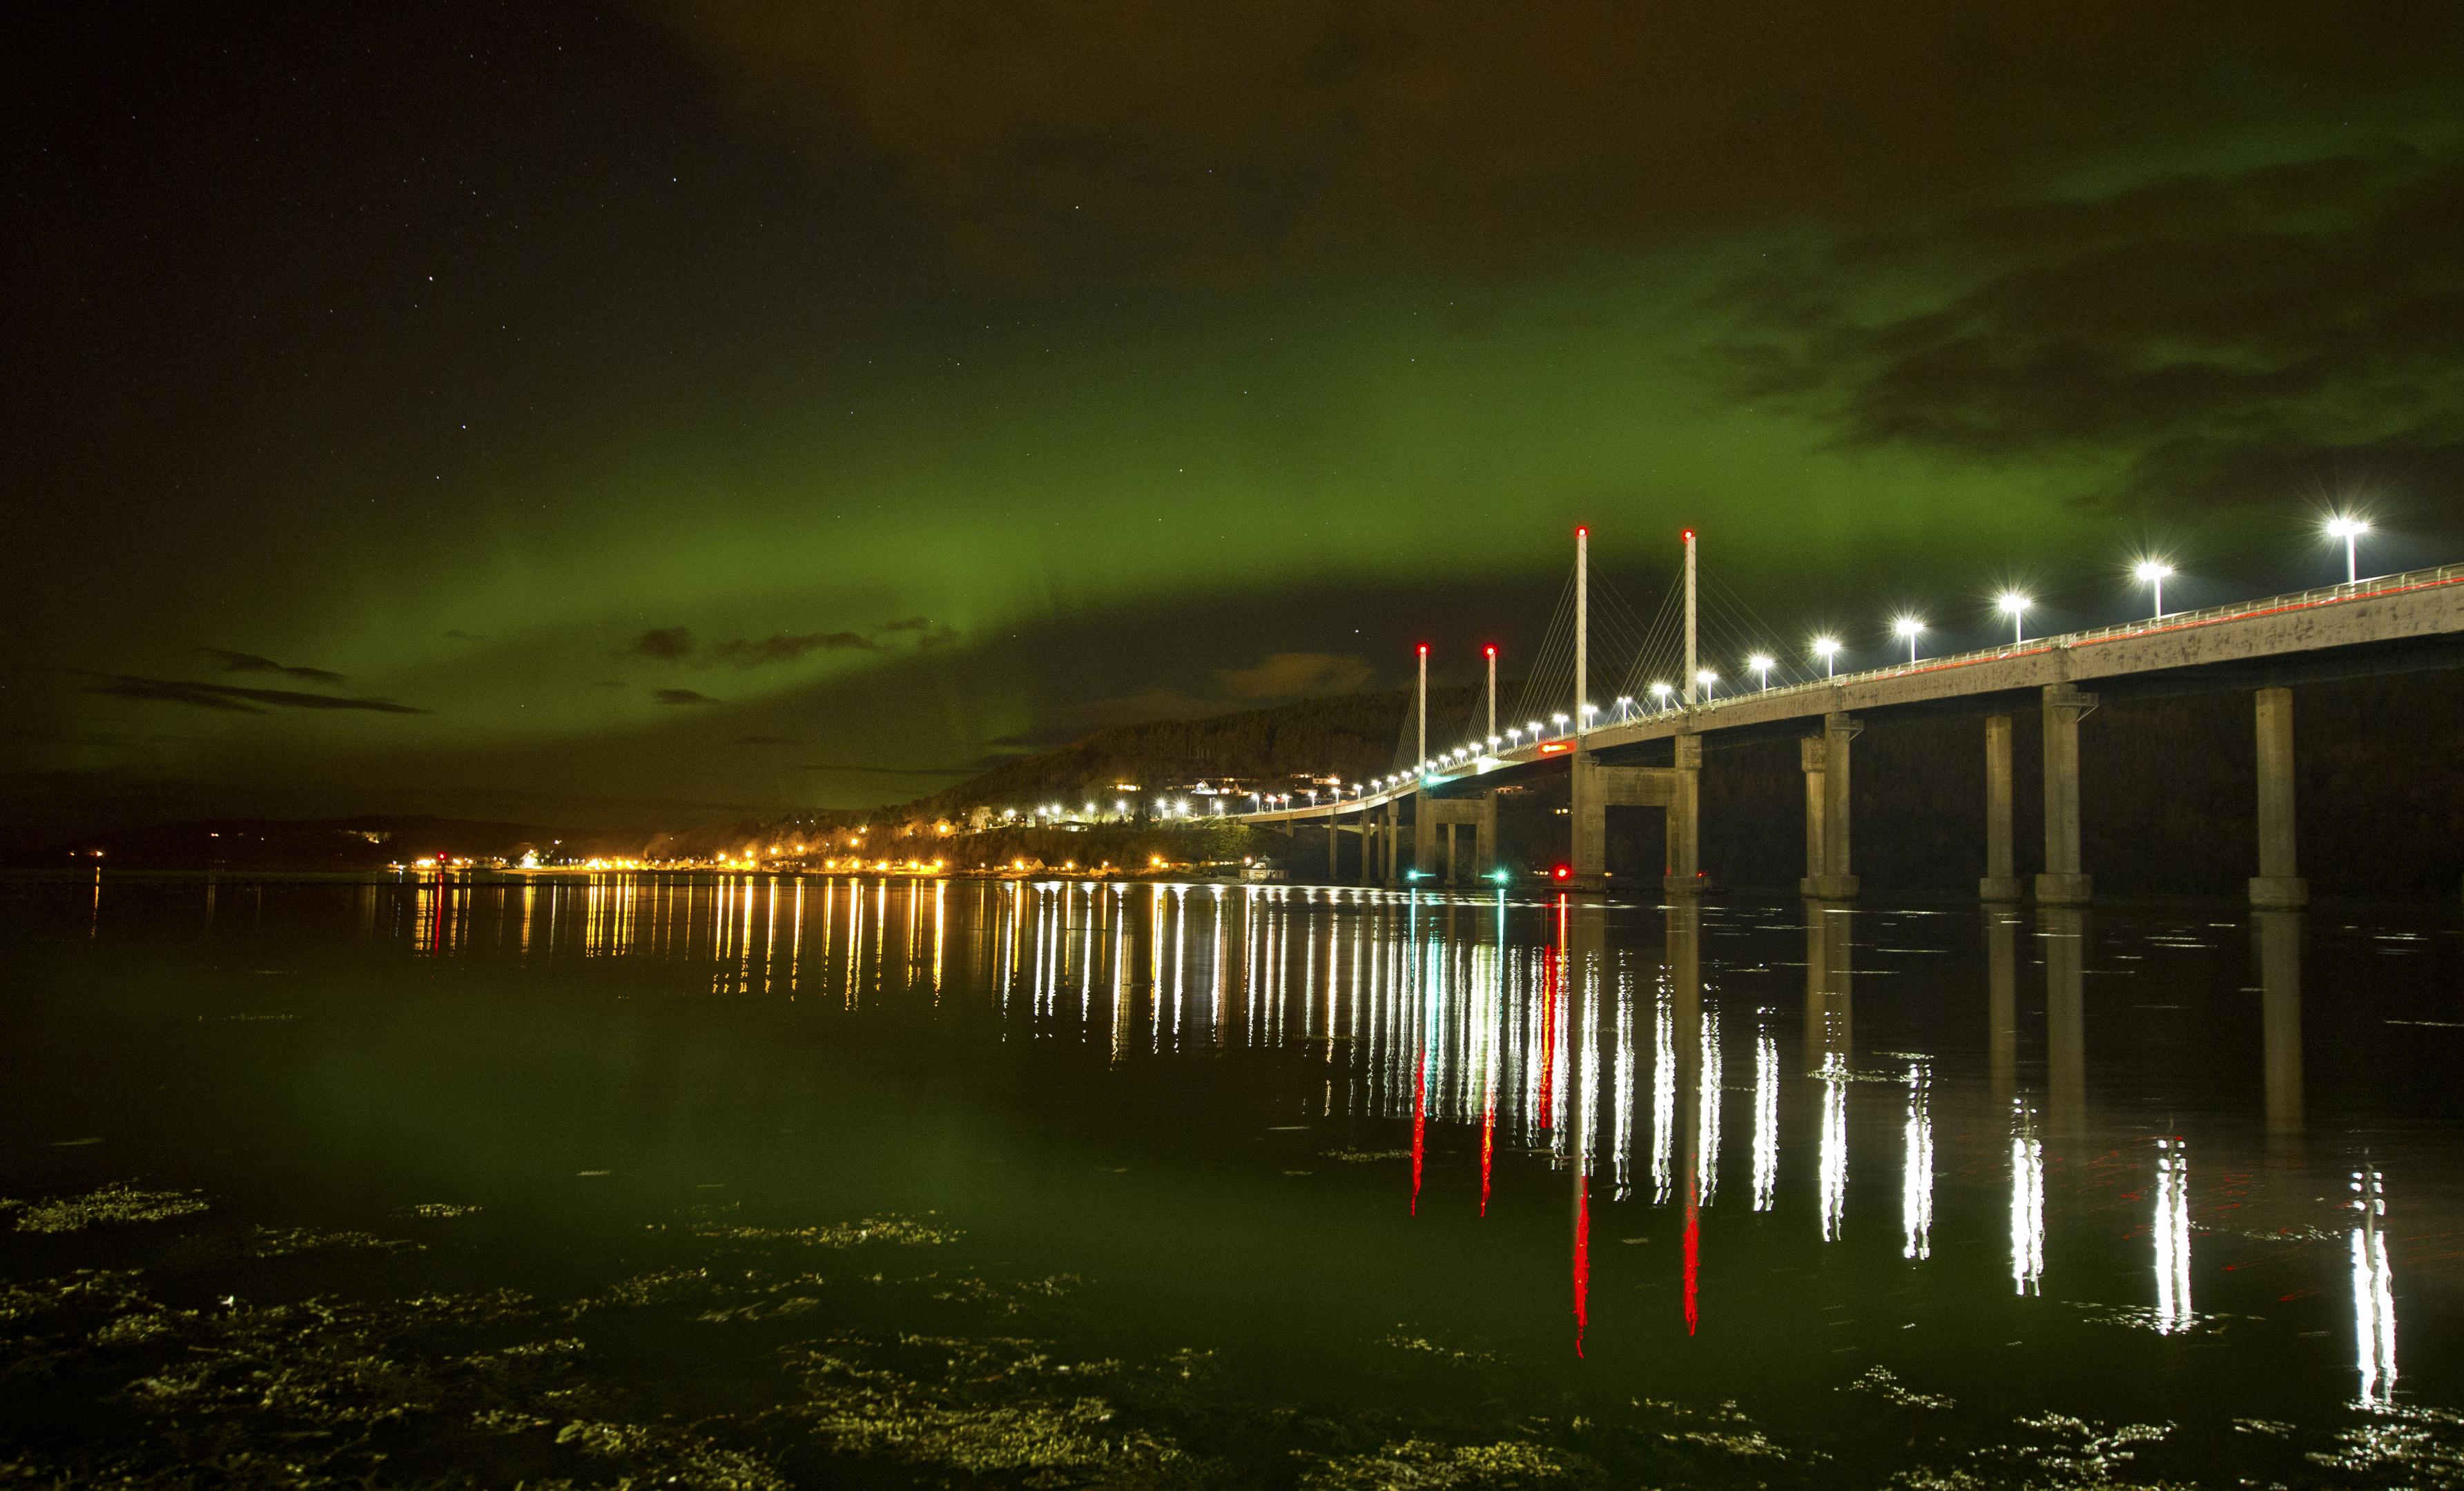 James MacRae at the Kessock Bridge, Inverness